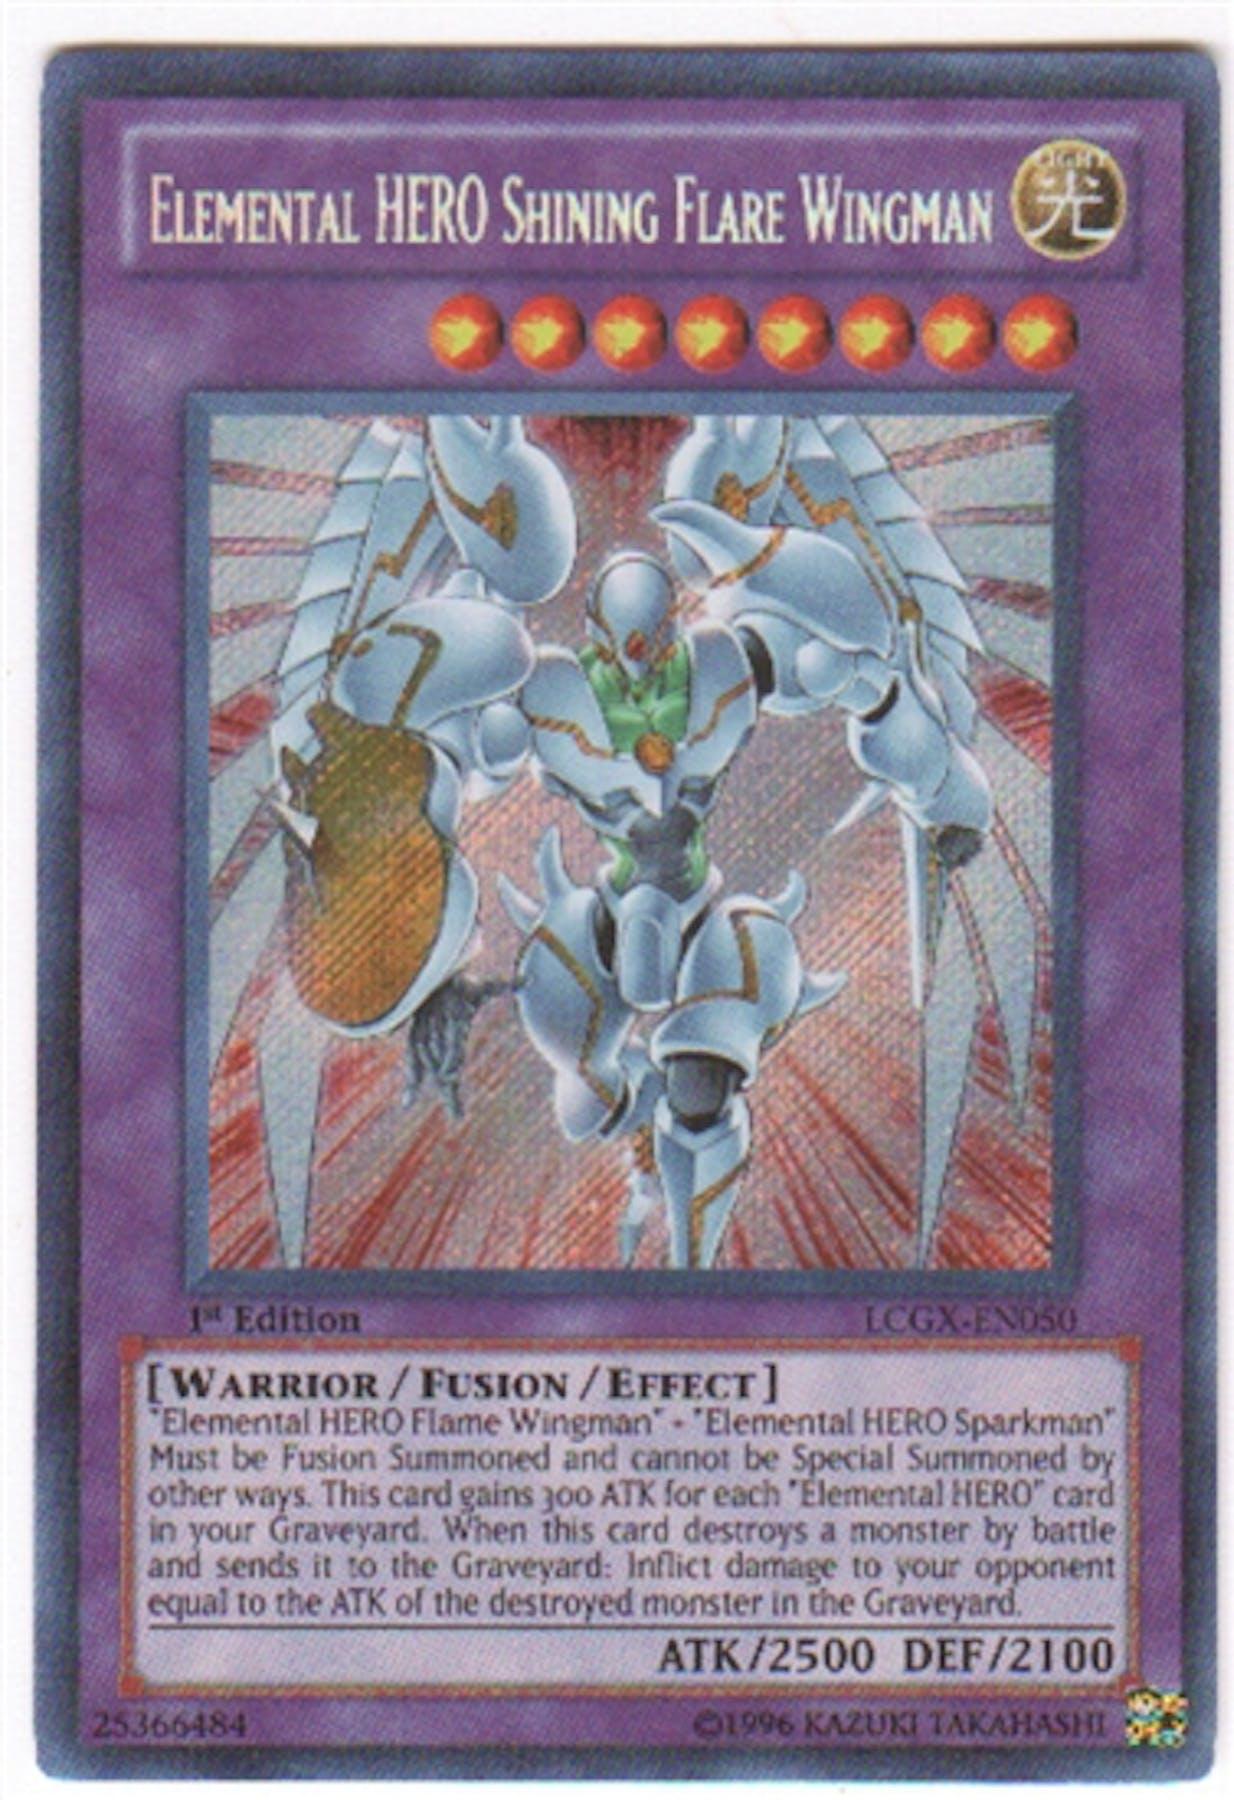 Yu-Gi-Oh Legendary Collection 2 Single Elemental HERO ...Elemental Hero Shining Flare Wingman Deck